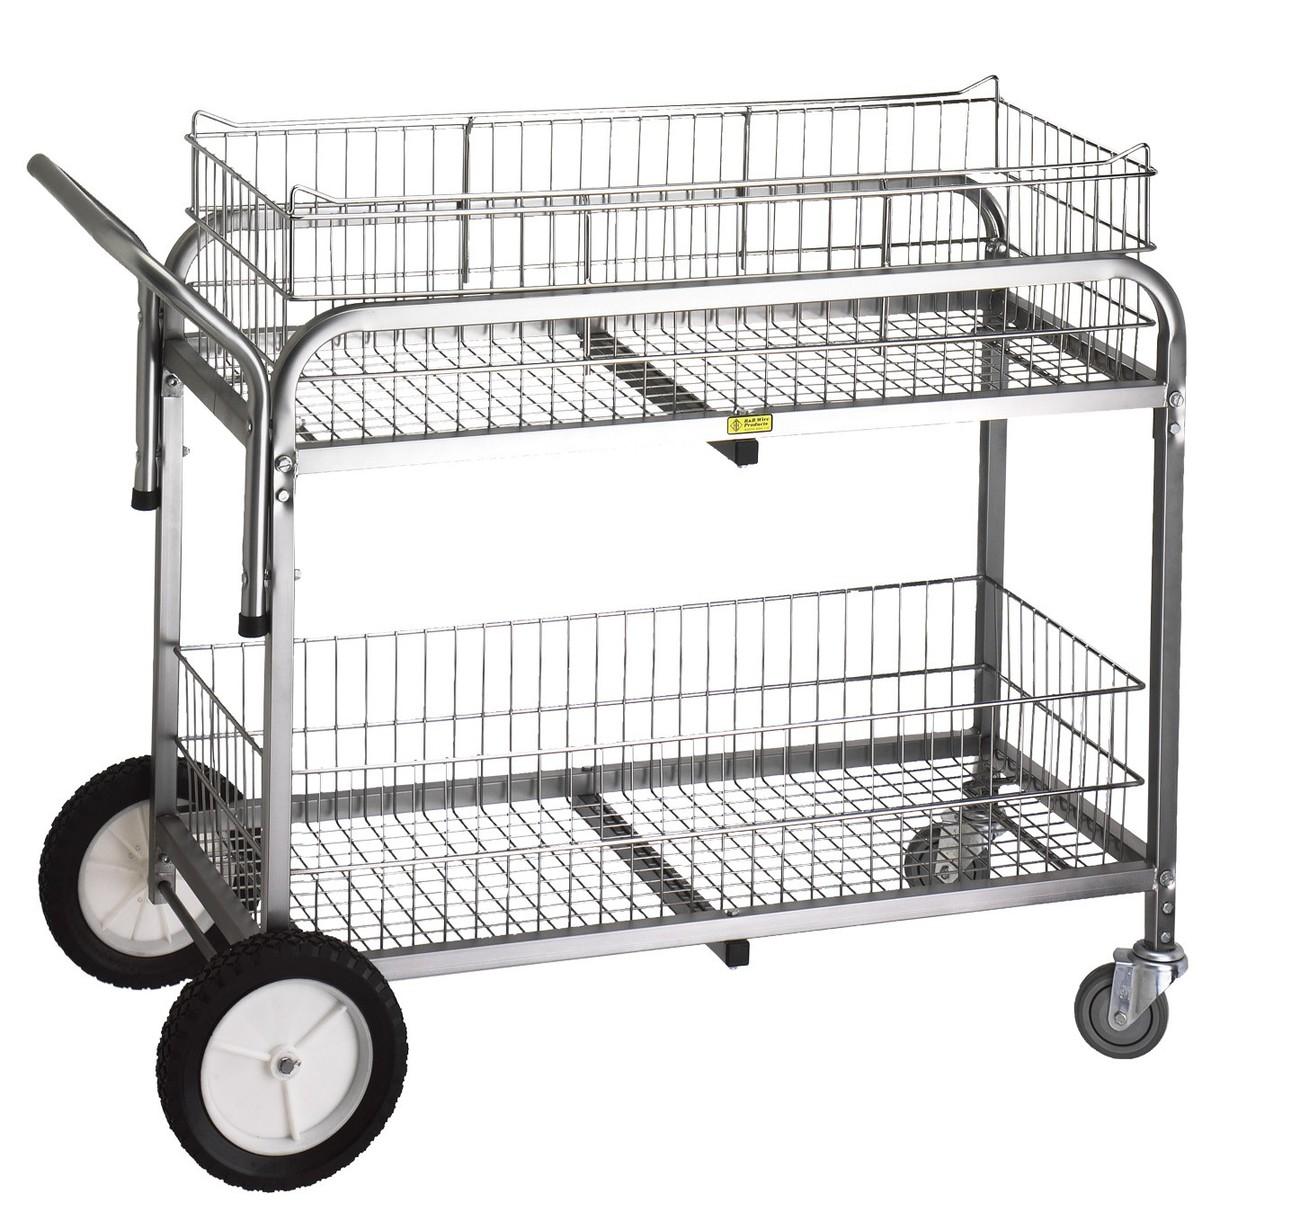 Large Capacity Utility Cart Model Number 510